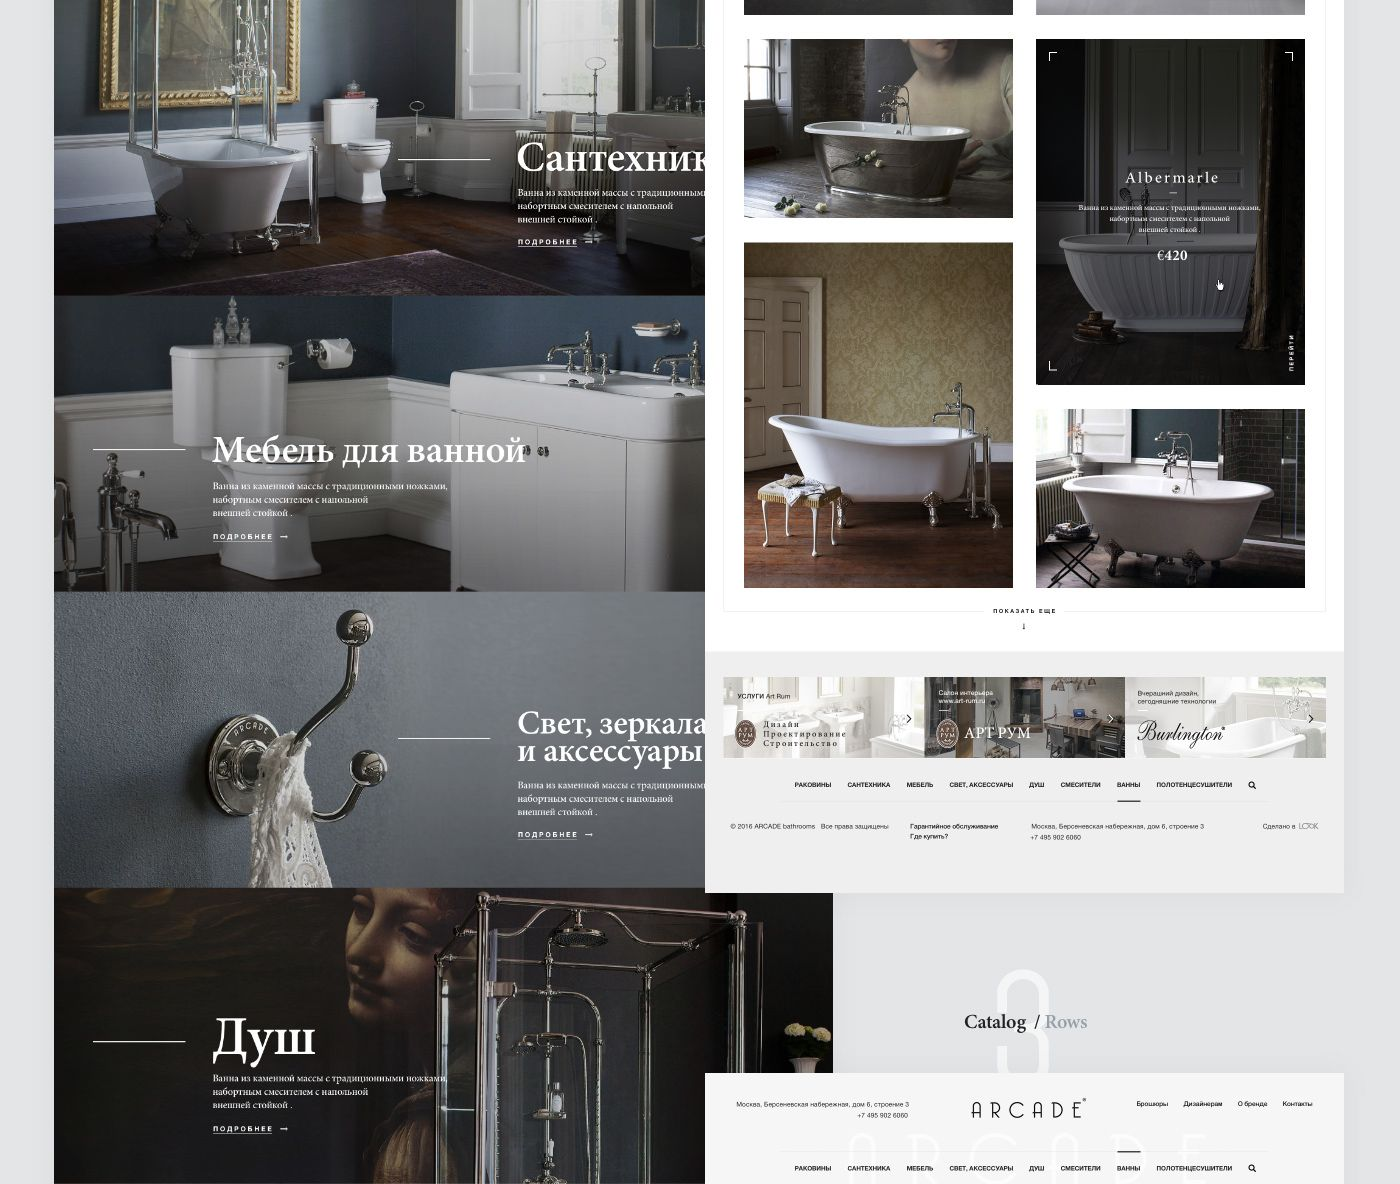 Arcade Bathrooms website – luxury sanitary ware from UK | Web design ...